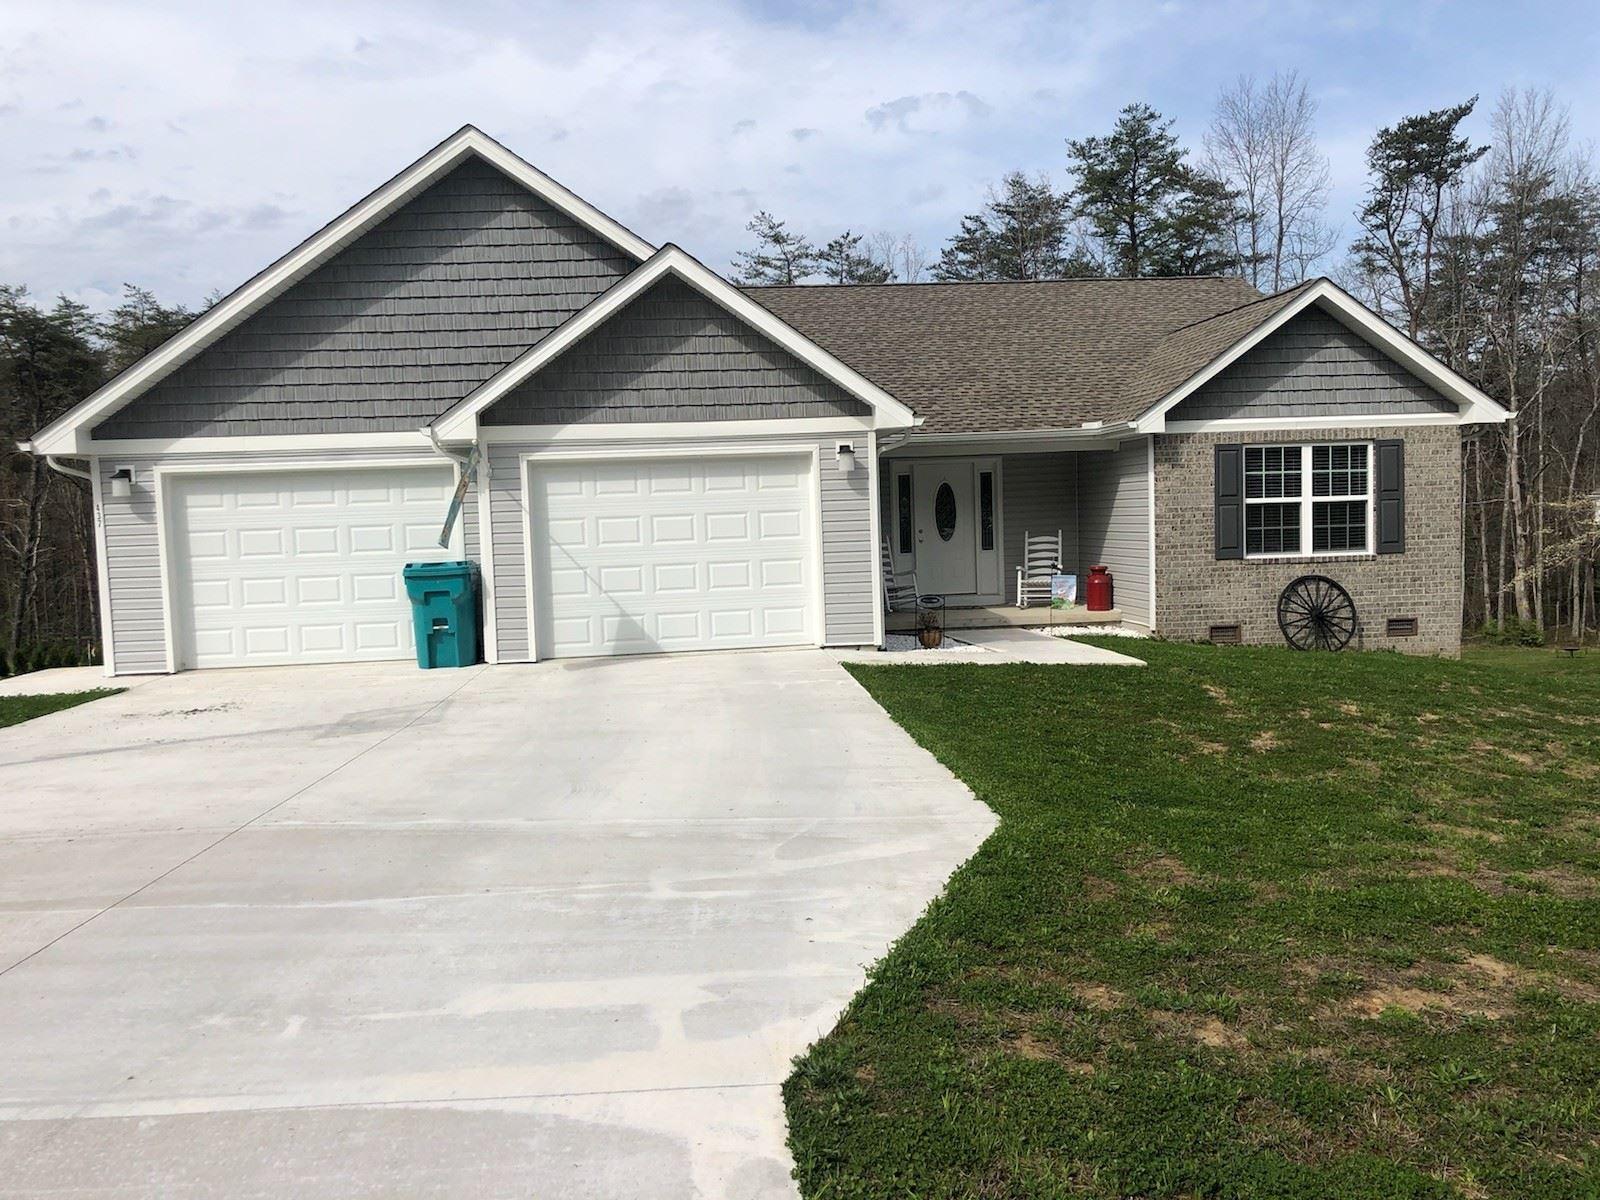 Photo of 437 Deerfield Rd, Crossville, TN 38555 (MLS # 2243359)